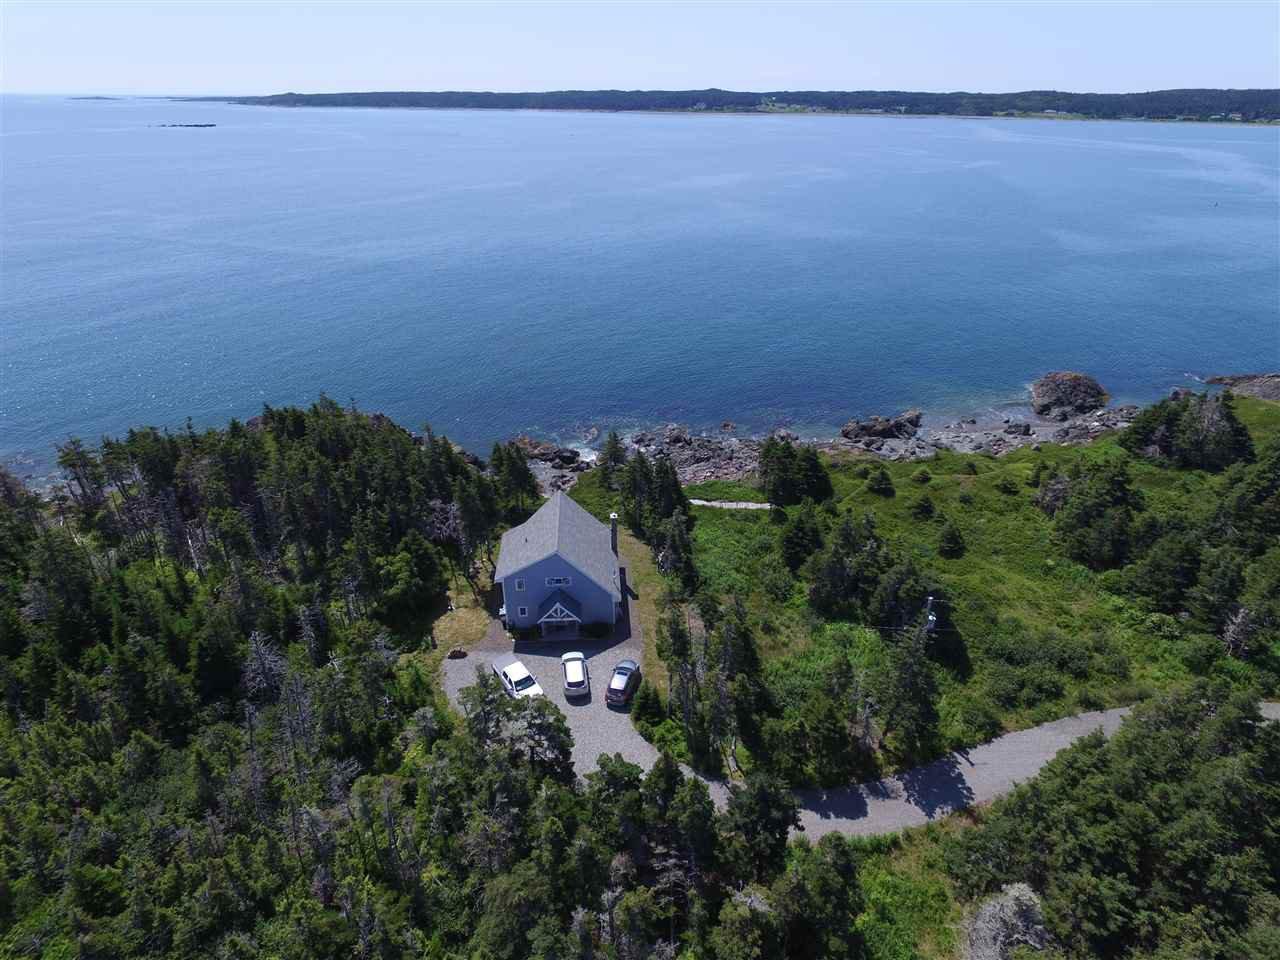 Main Photo: 2525 Main A Dieu Road in Main-À-Dieu: 207-C. B. County Residential for sale (Cape Breton)  : MLS®# 202005663